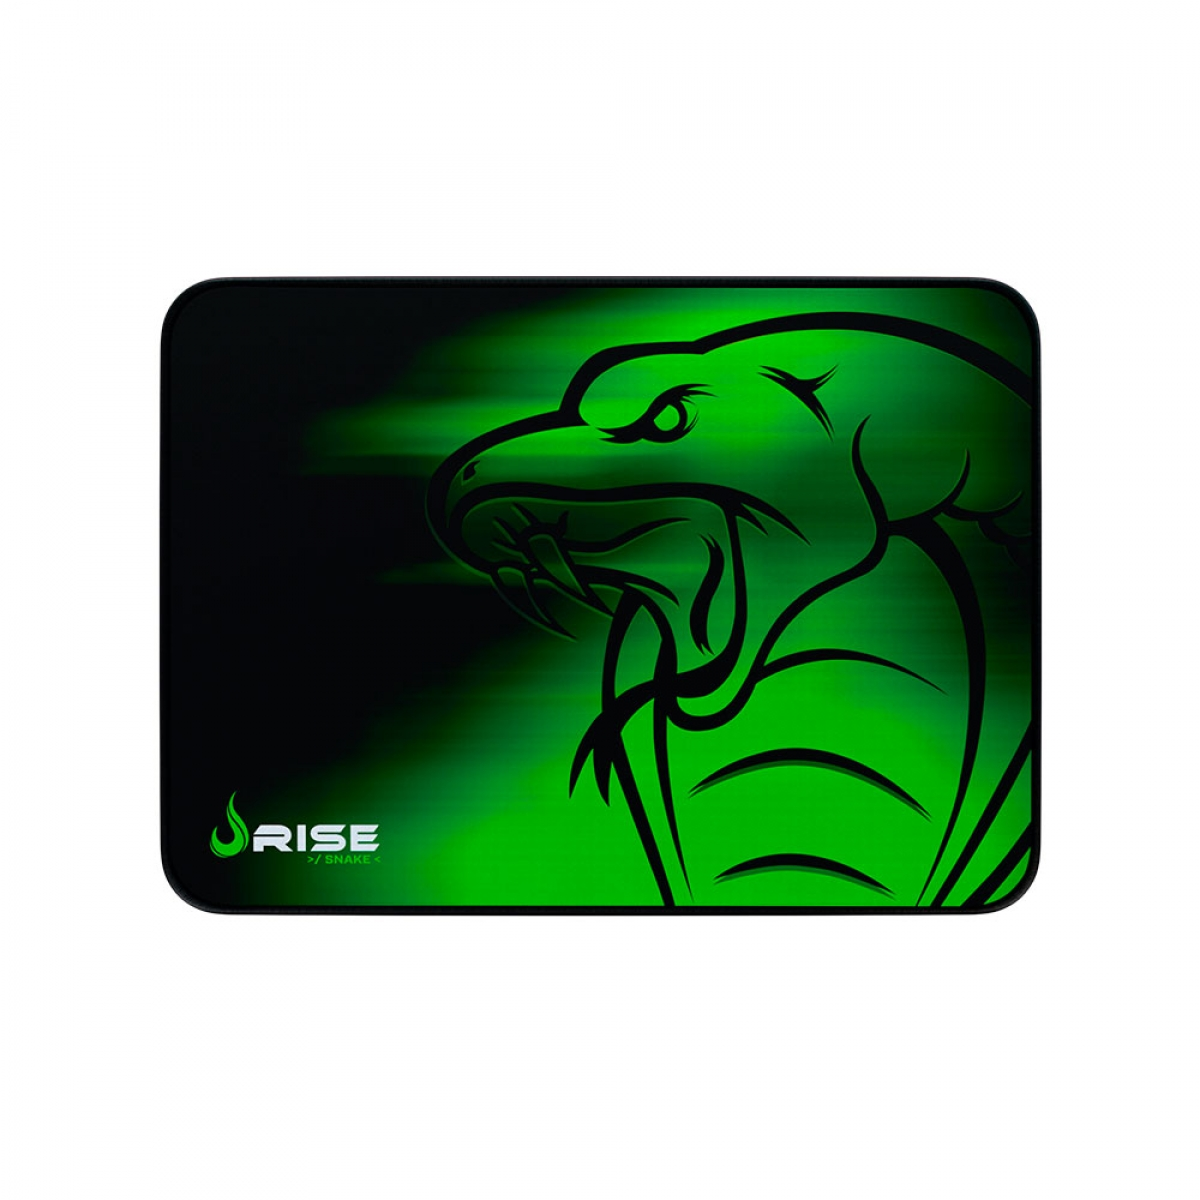 Mouse Pad Gamer Rise Mode SNAKE MÉDIO BORDA COSTURADA RG-MP-04-SE